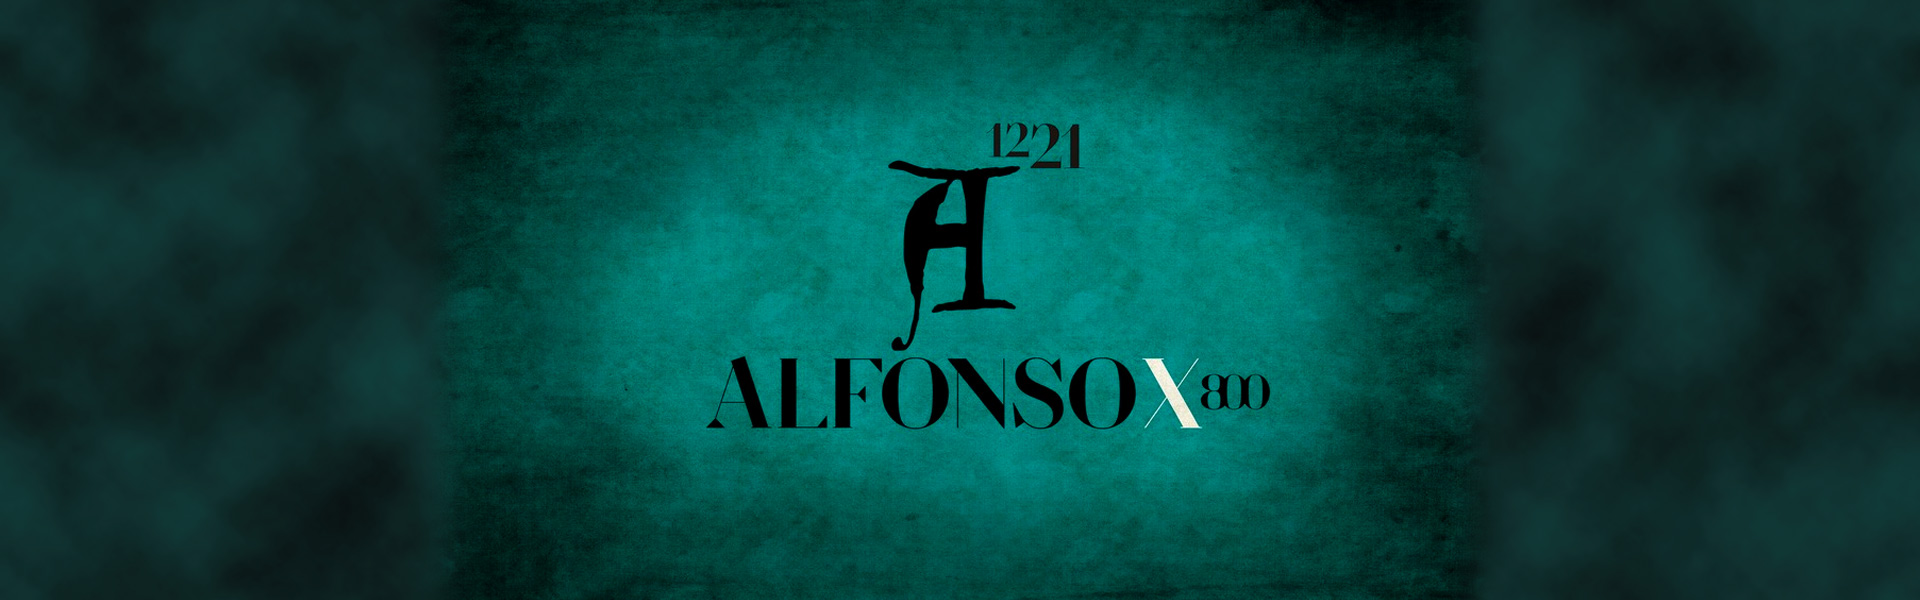 ALFONSO X 800 ANIVERSARIO